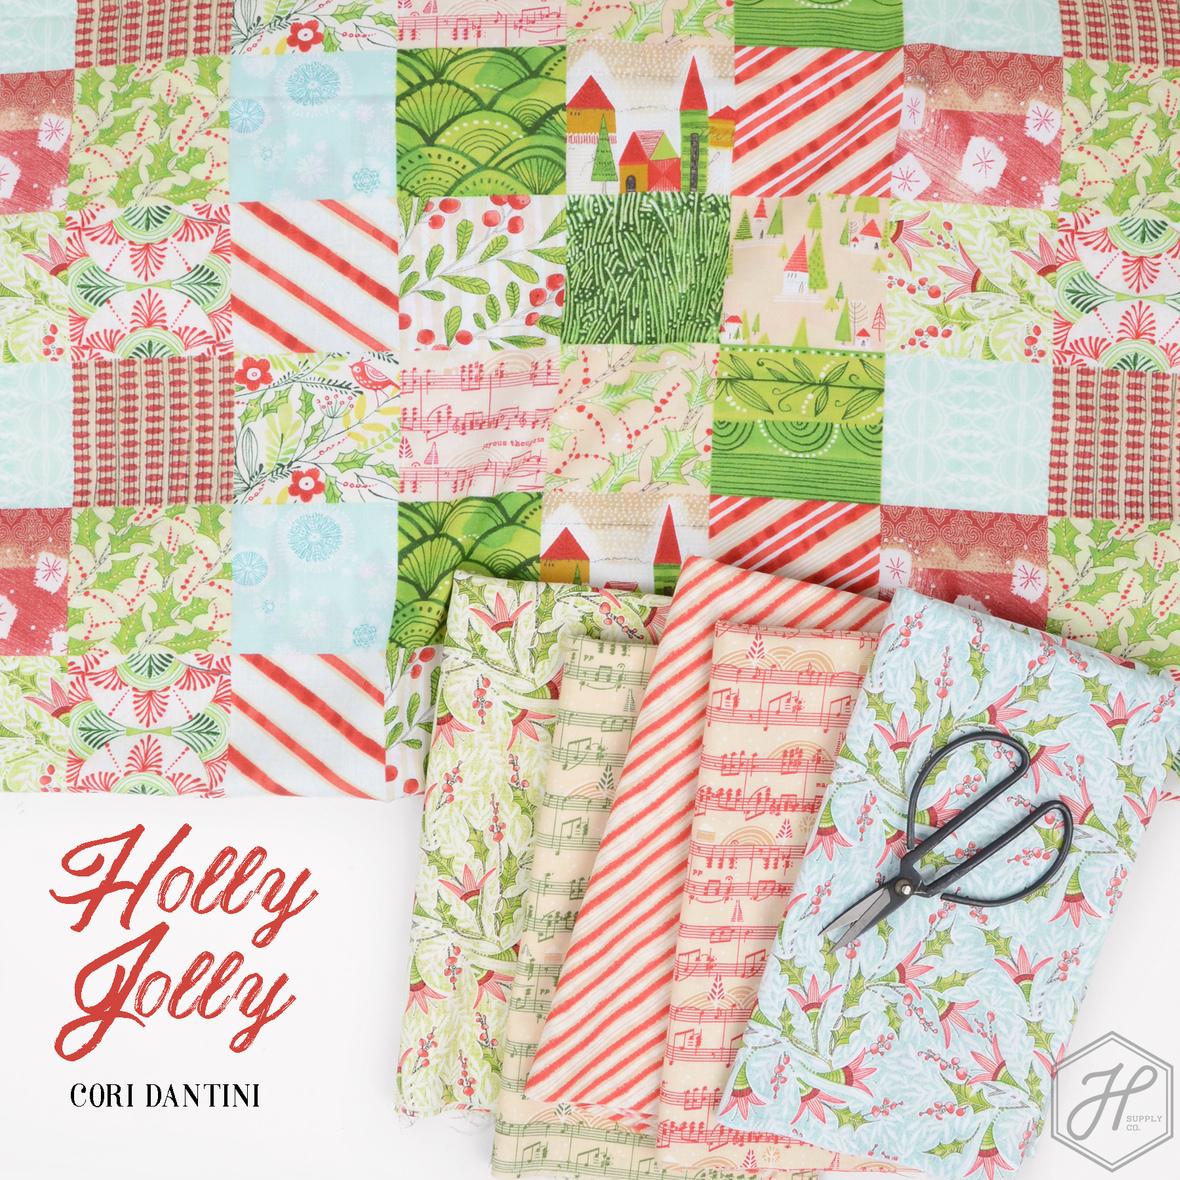 Holly Jolly Cori Dantini for Free Spirit at Hawthorne Supply Co